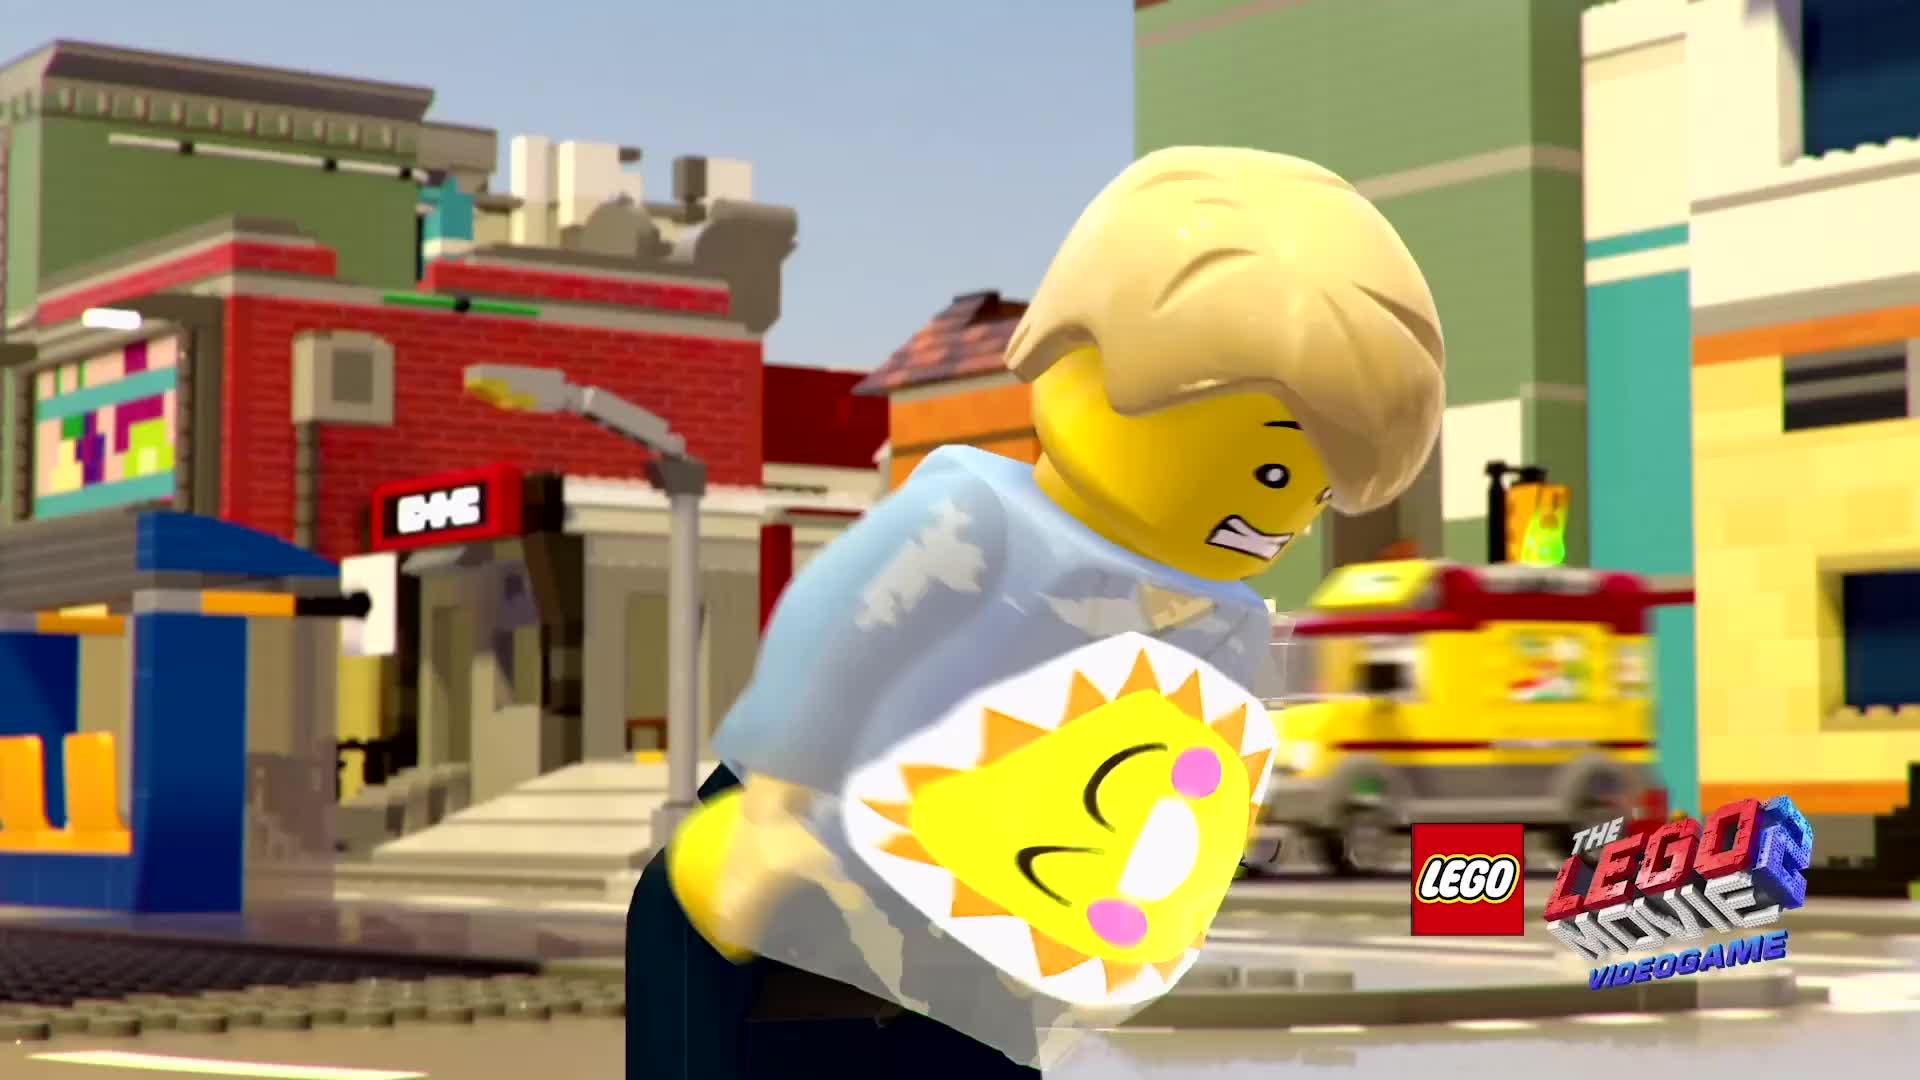 Trailer, Warner Bros., Lego, The Lego Movie 2, The Lego Movie Videogame 2, Lego Movie